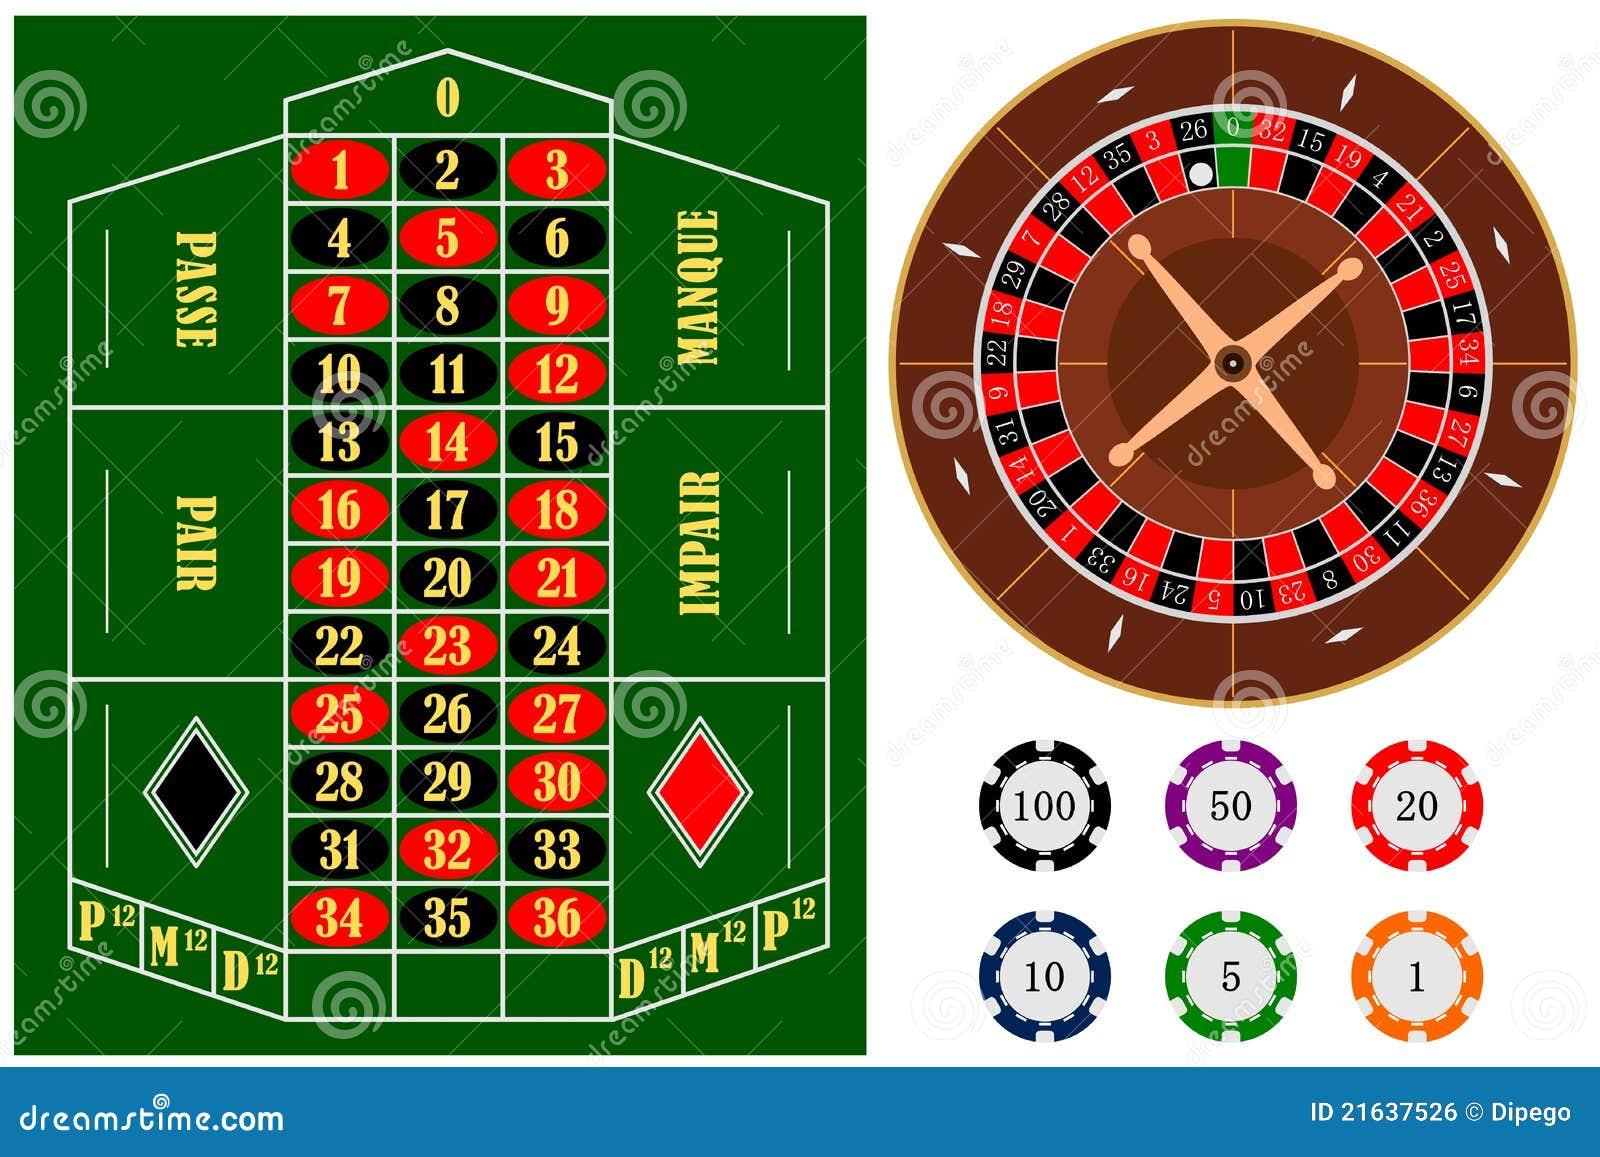 Europäisches Roulette Regeln Times -270551